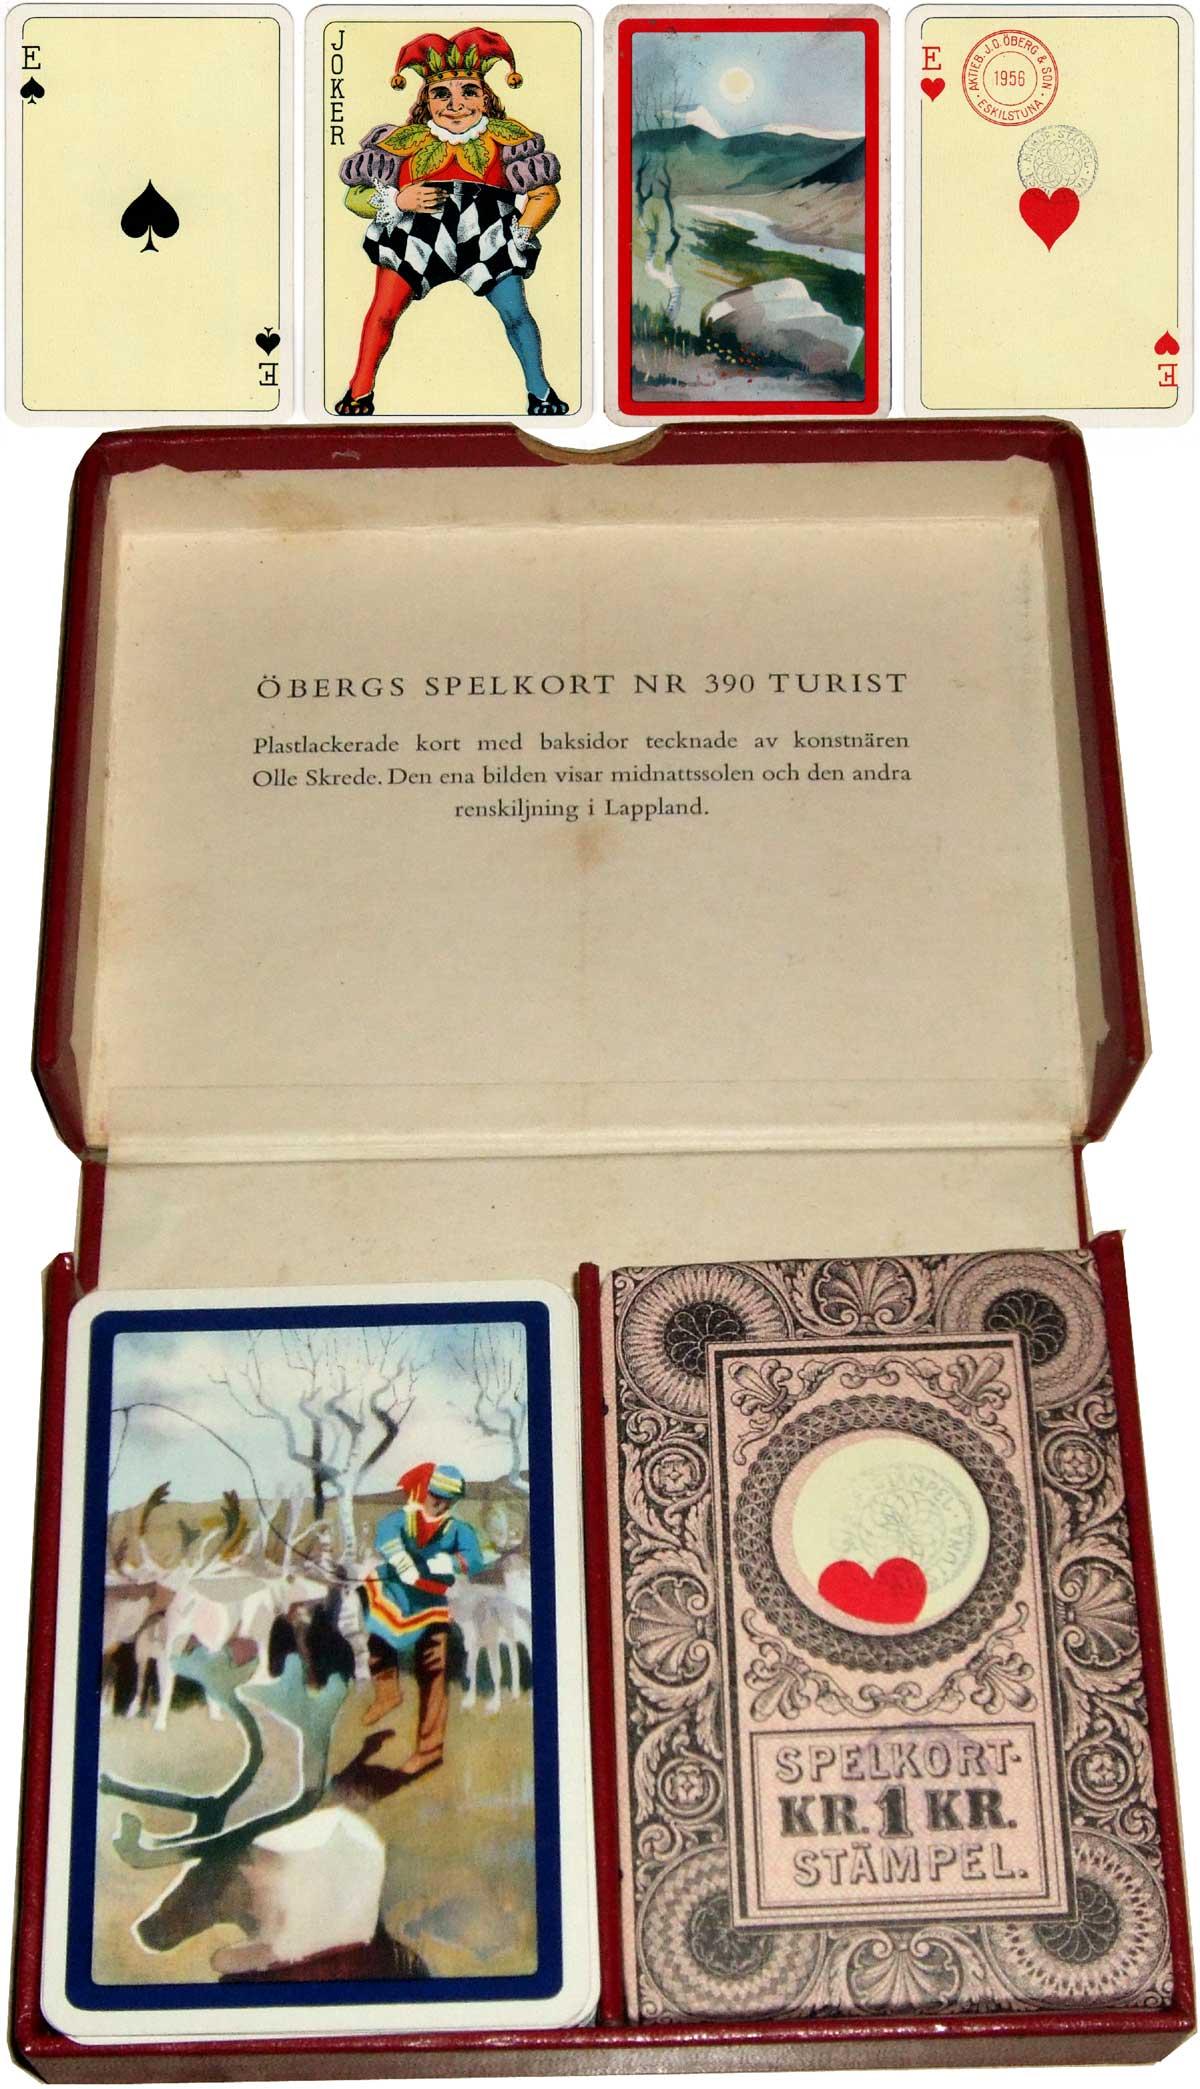 Öbergs Spelkort Nr 390 Turist, 1956